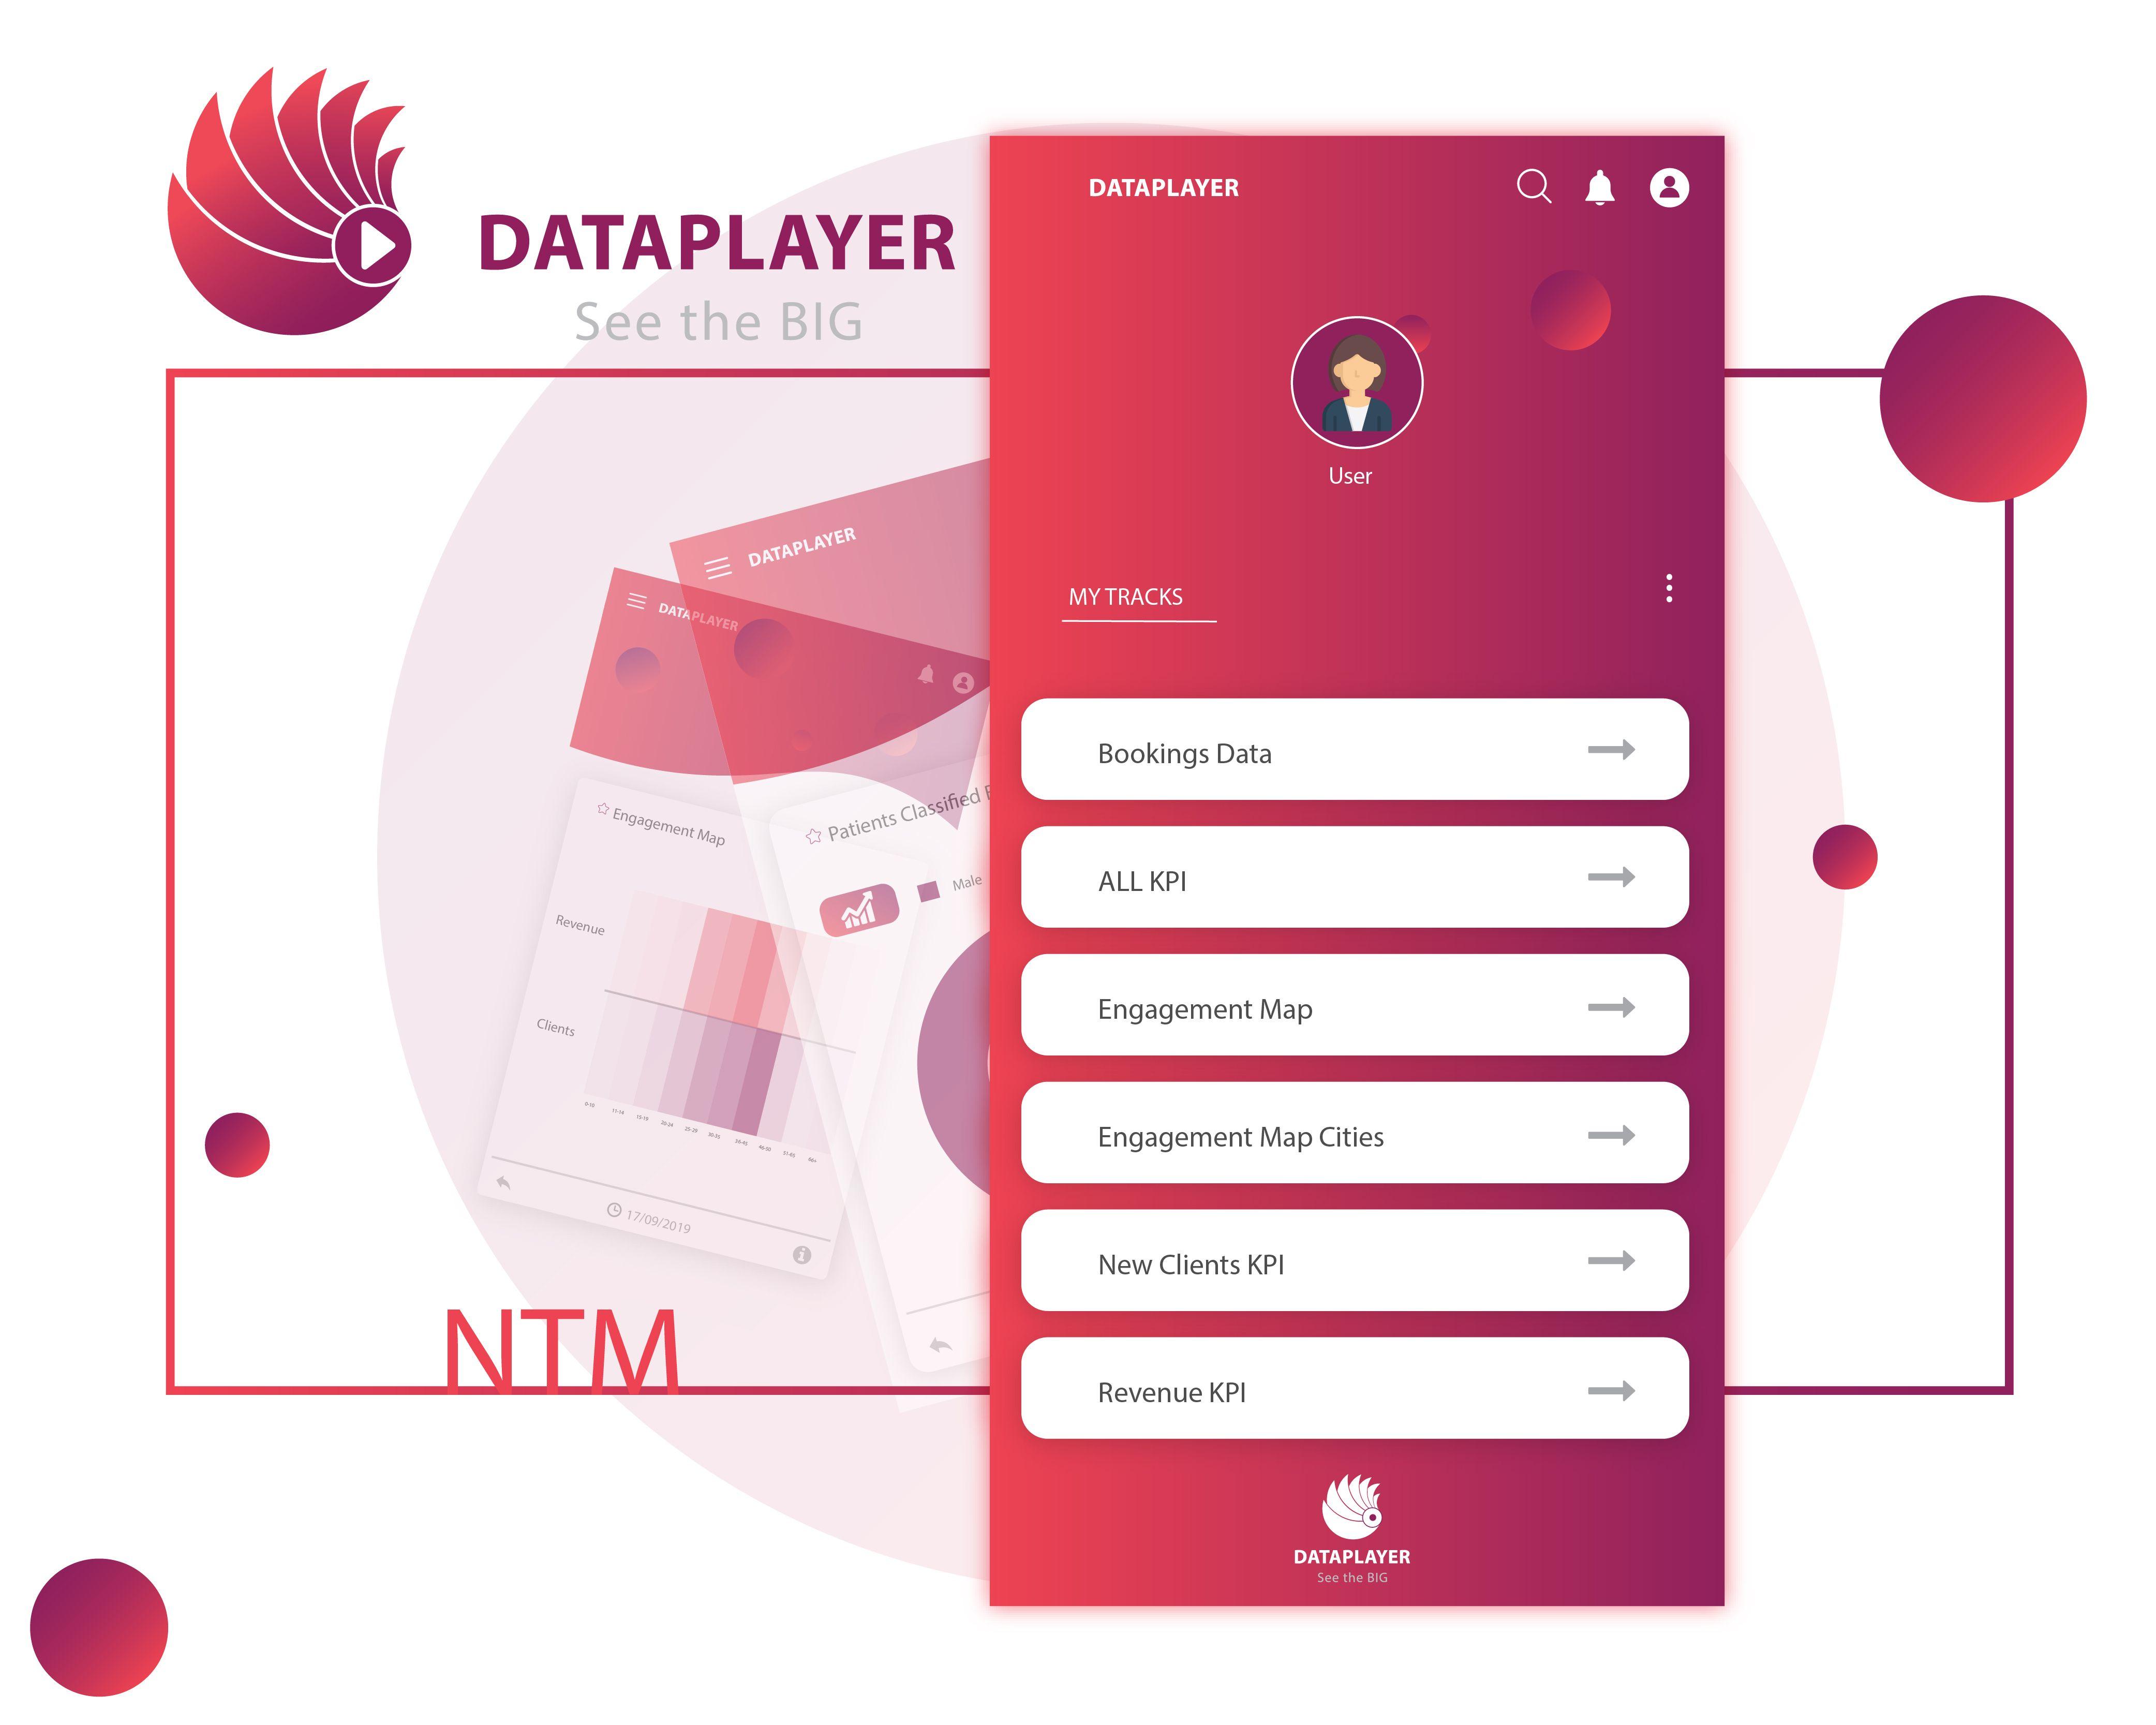 Tracking in dataplayer